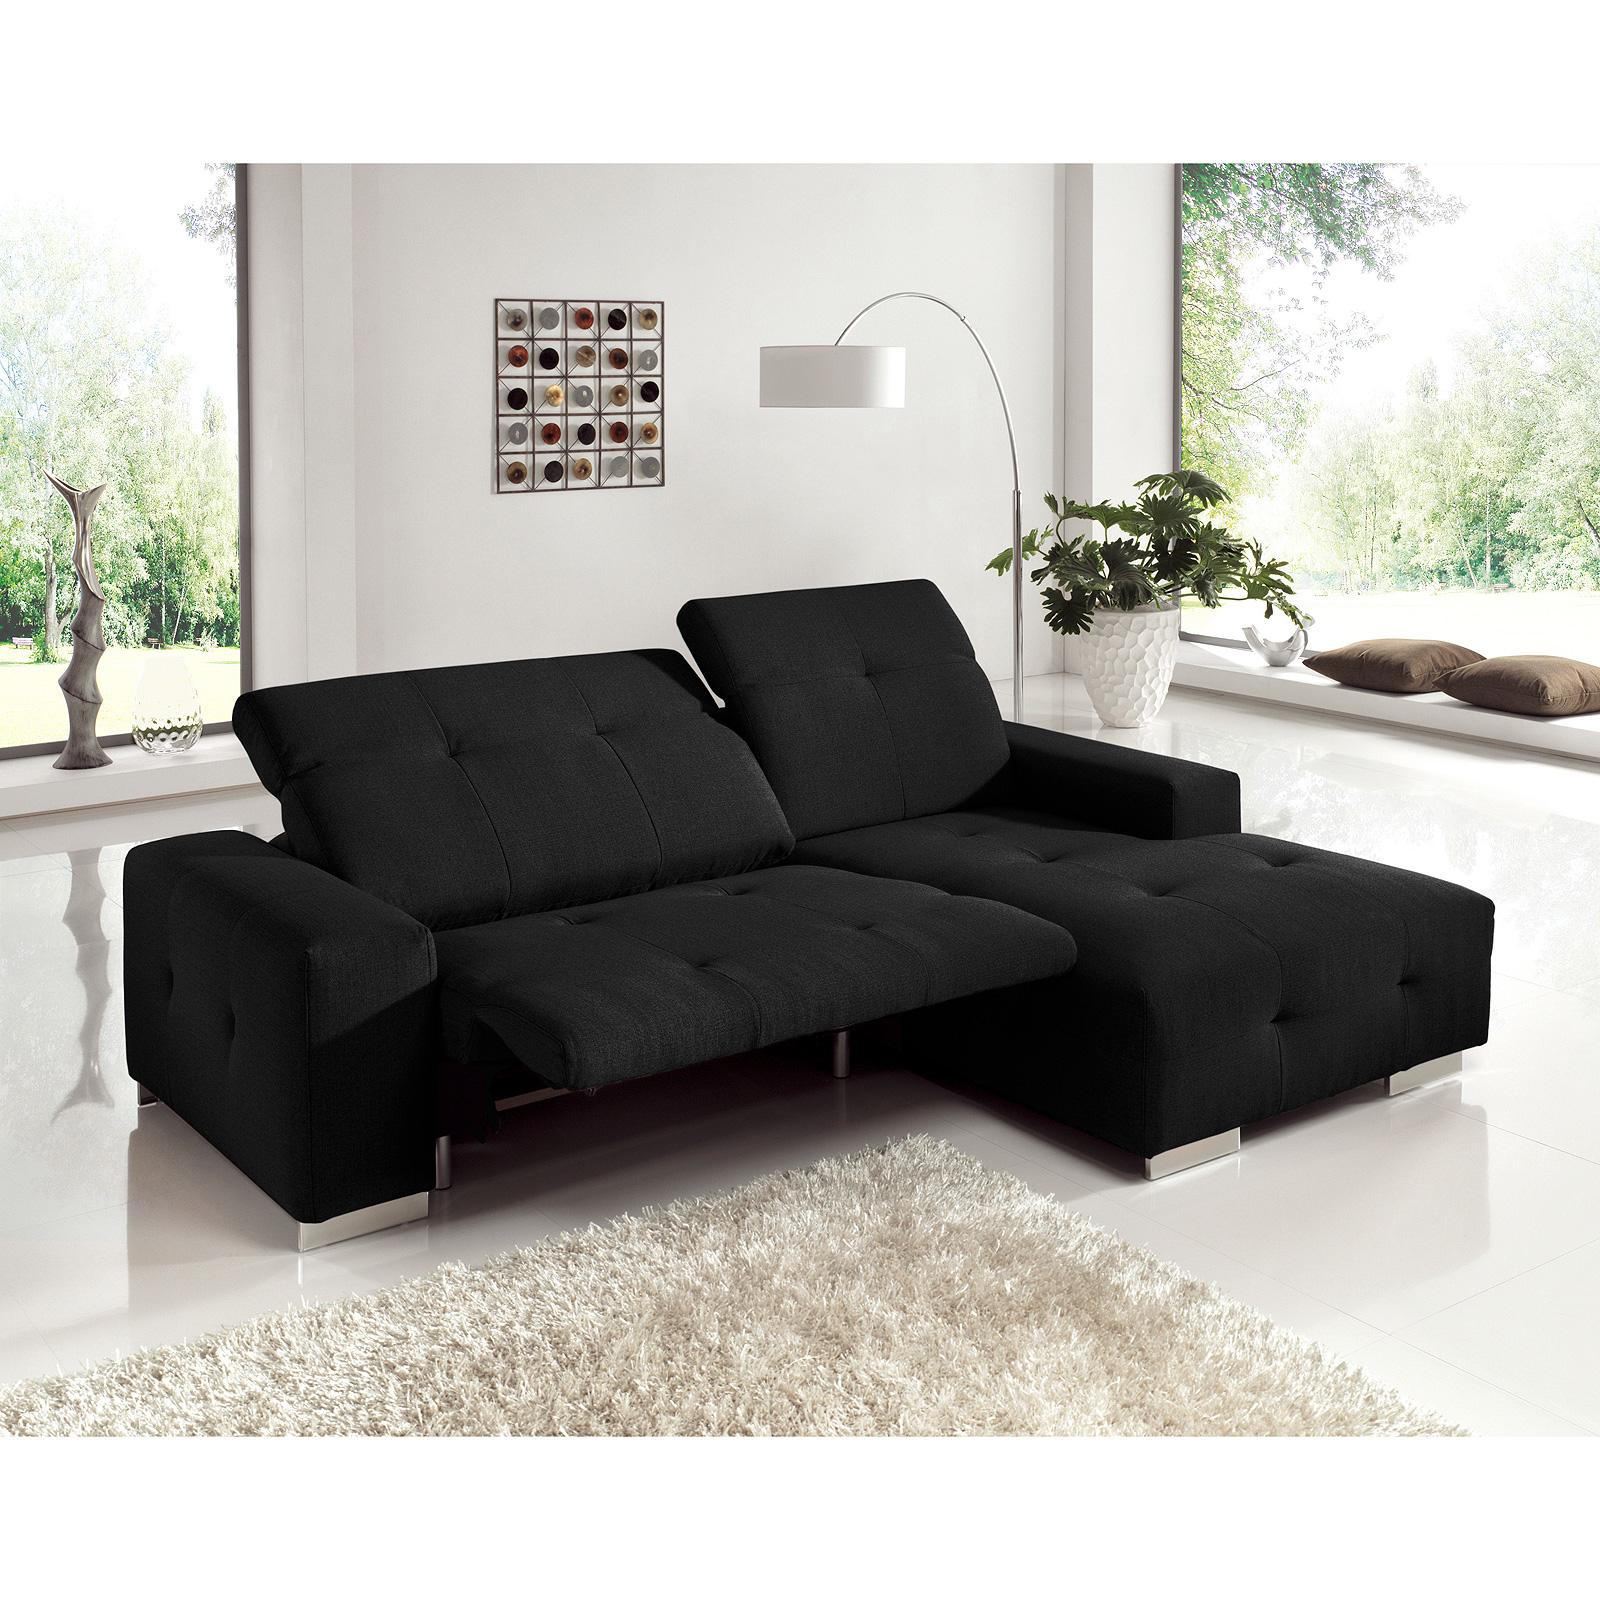 ecksofa francisco sofa polsterecke wohnlandschaft mit auswahl ebay. Black Bedroom Furniture Sets. Home Design Ideas